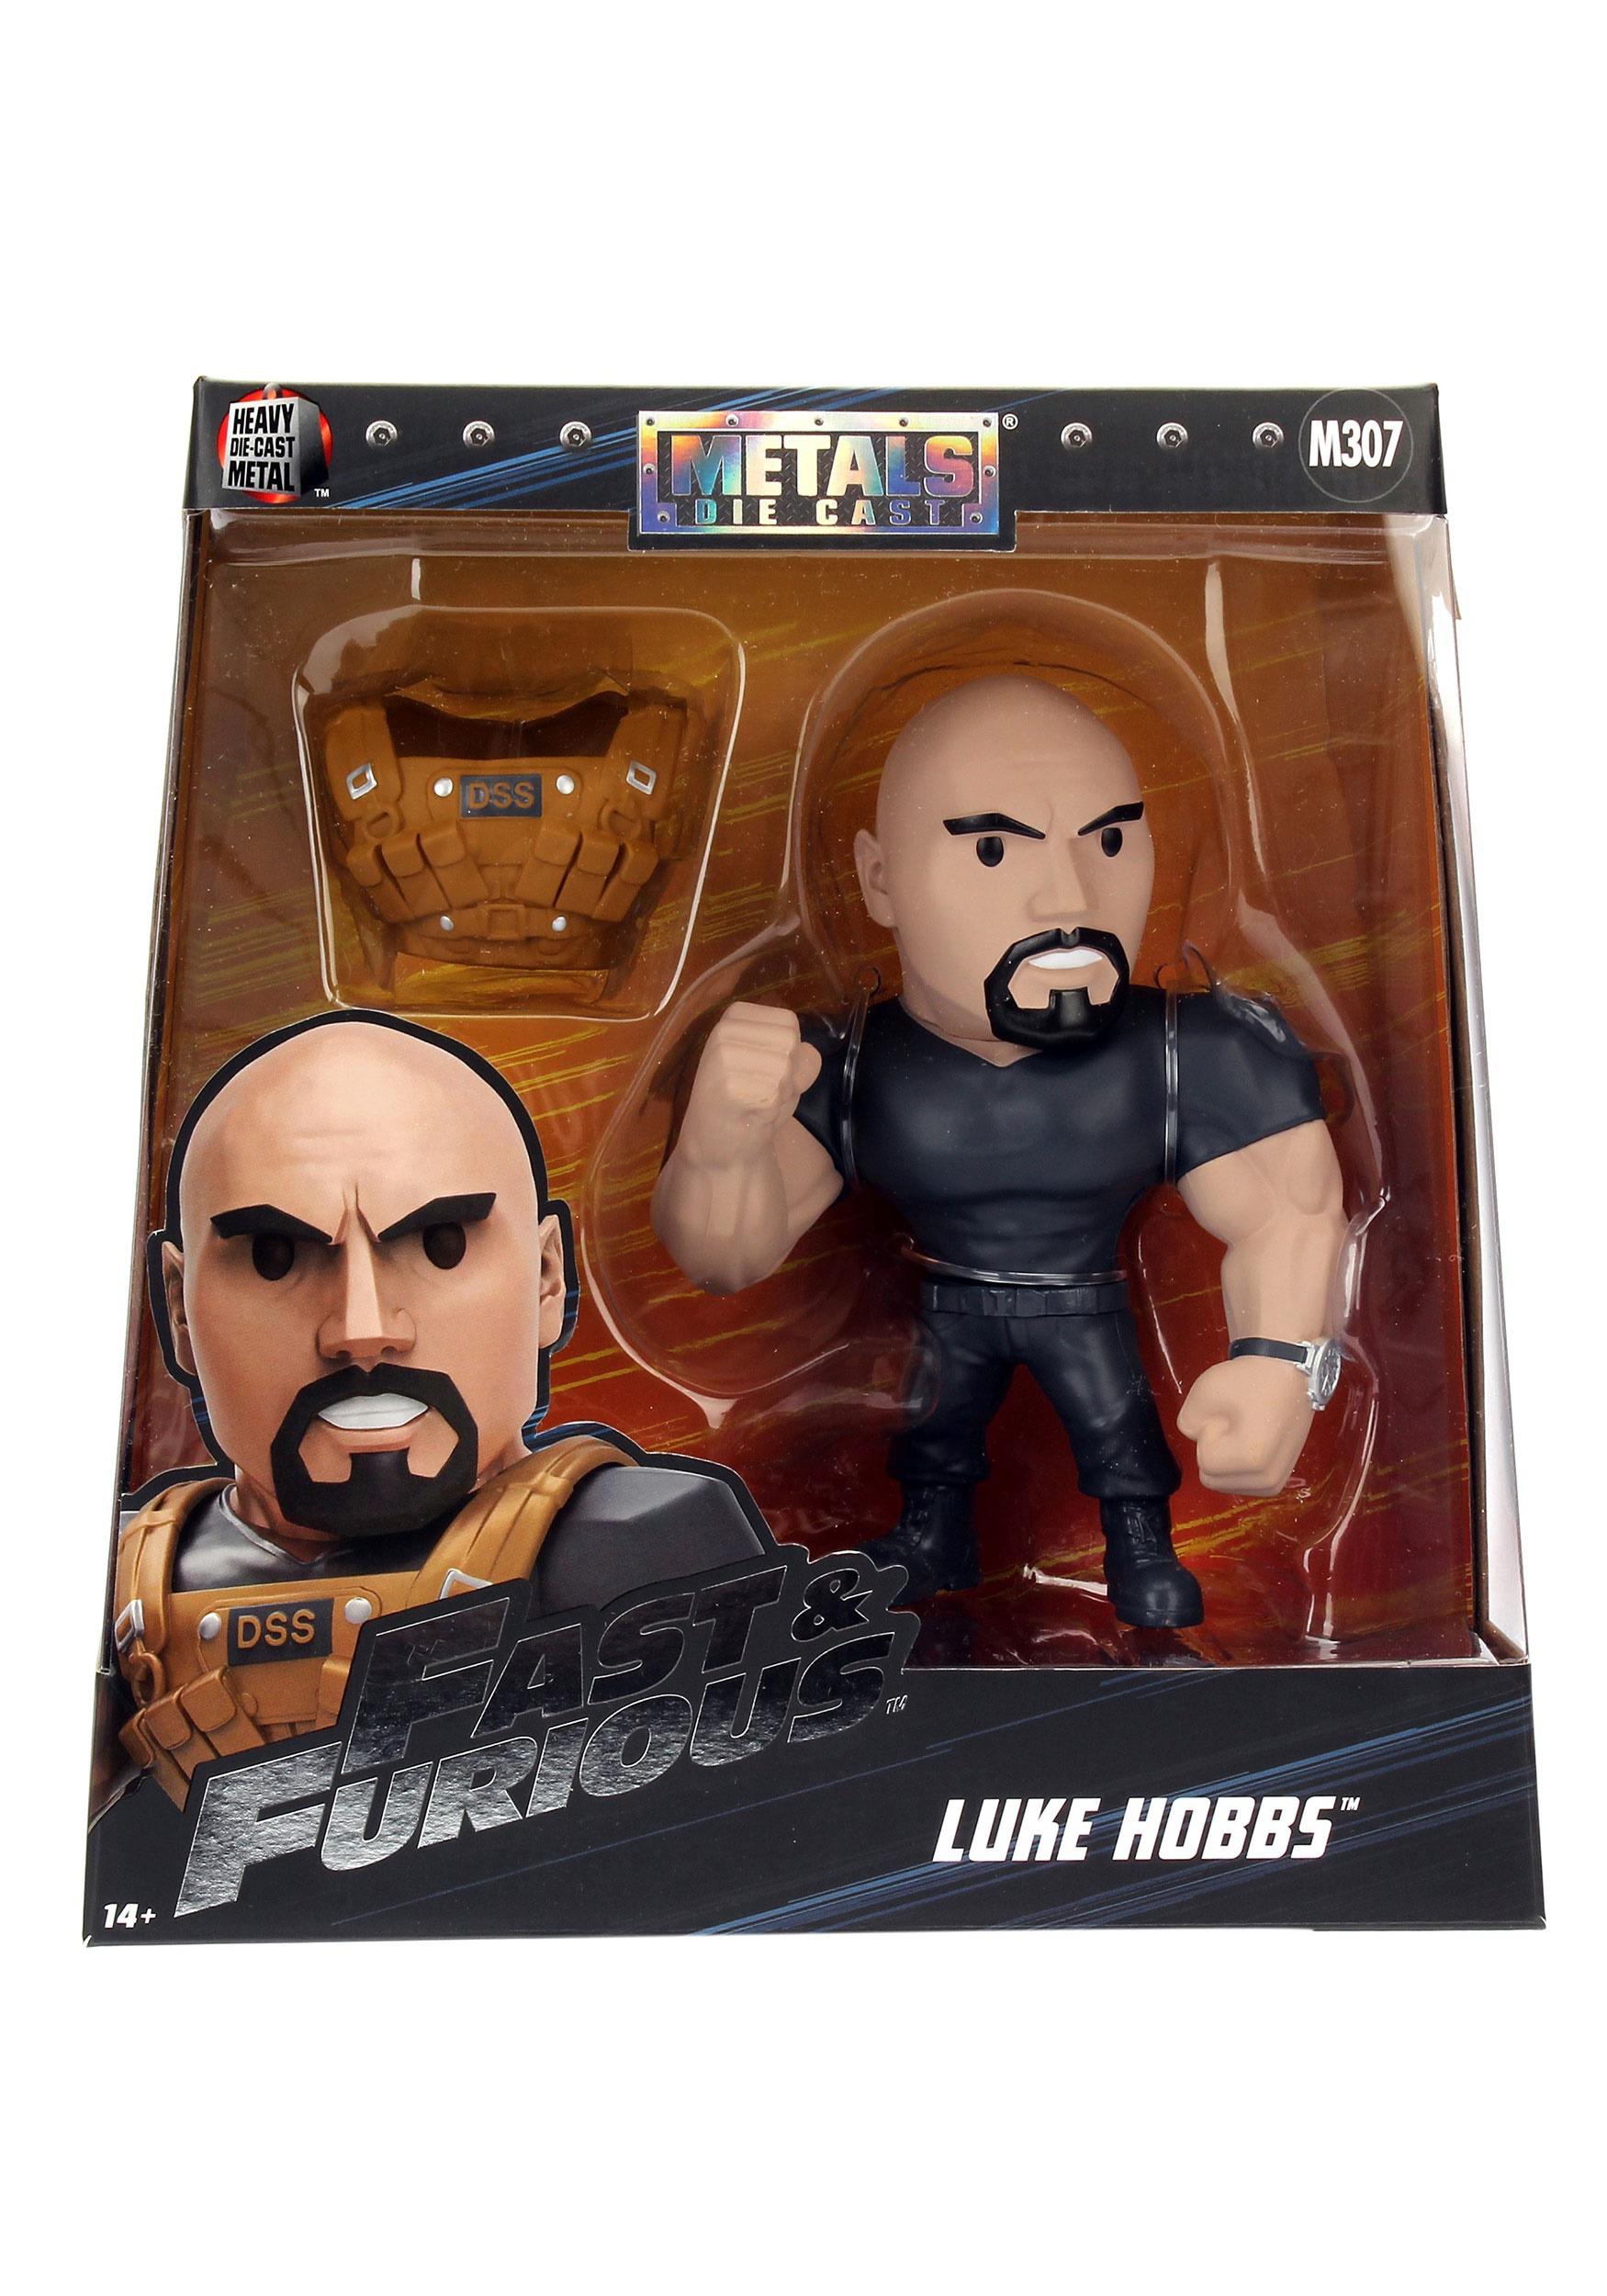 "Fast & the Furious Luke Hobbs 6"" Metal Figure JD97997"